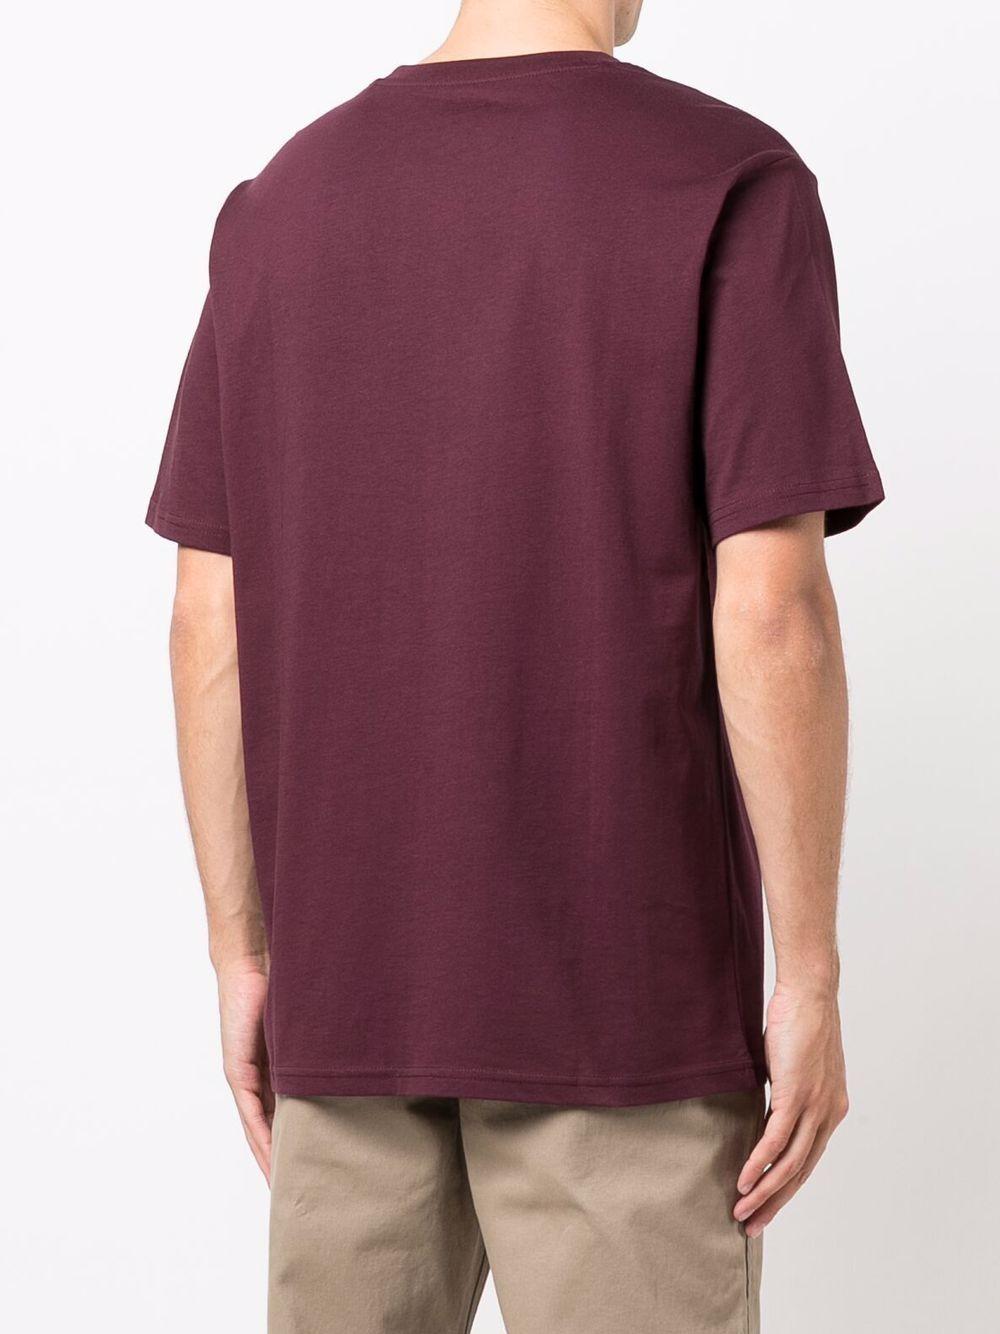 T-shirt con logo Bordeaux in Cotone Uomo DICKIES   T-shirt   DK0A4XDBMR01